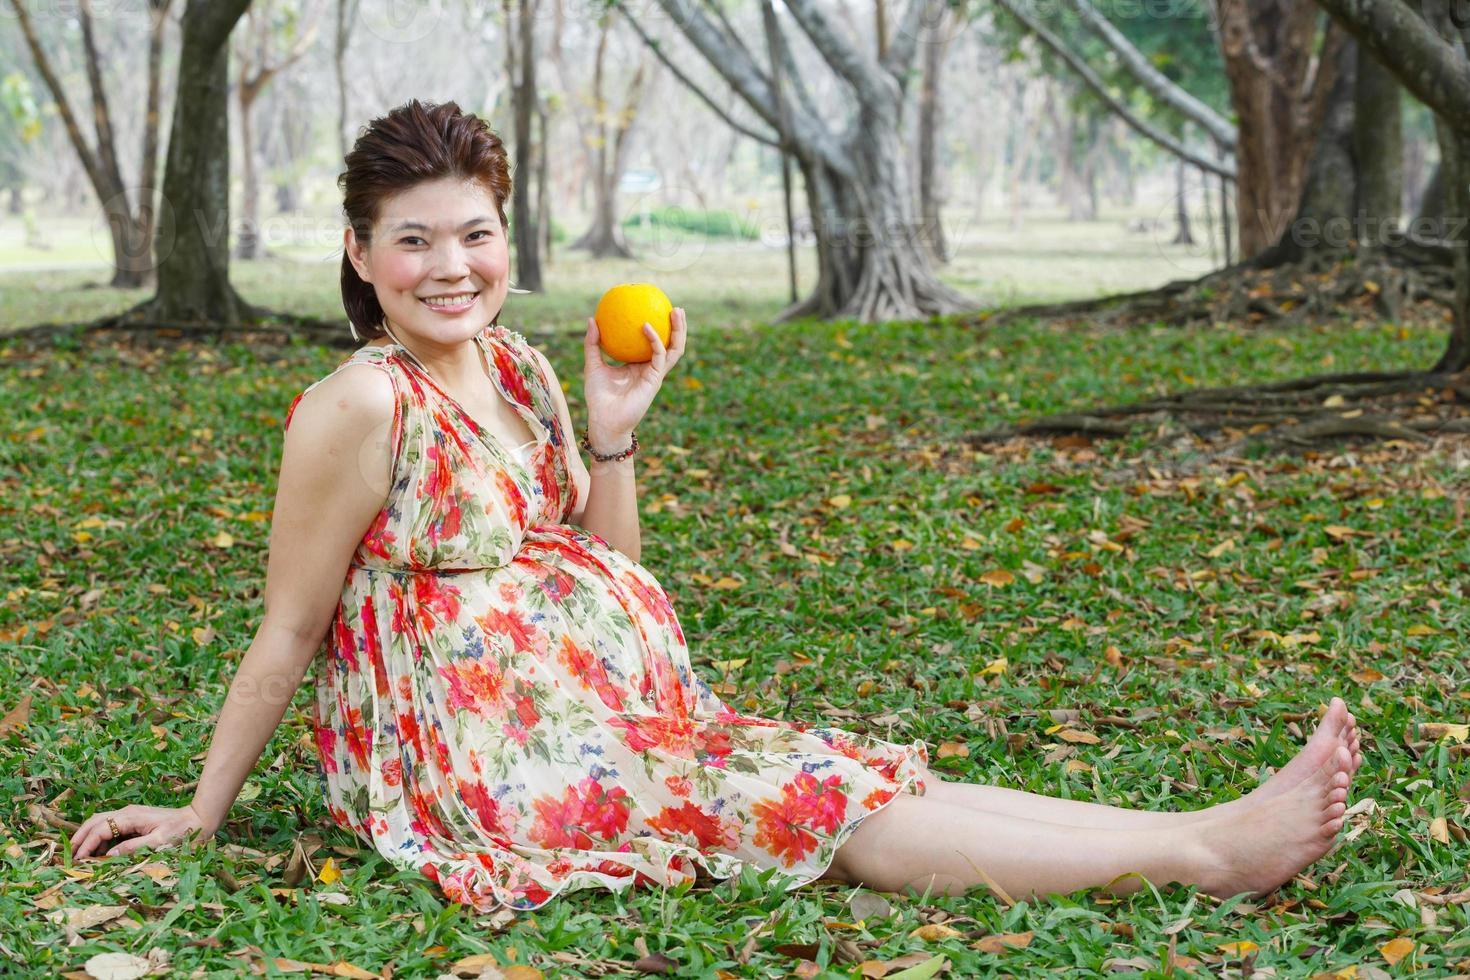 asiatische schwangere Frau foto